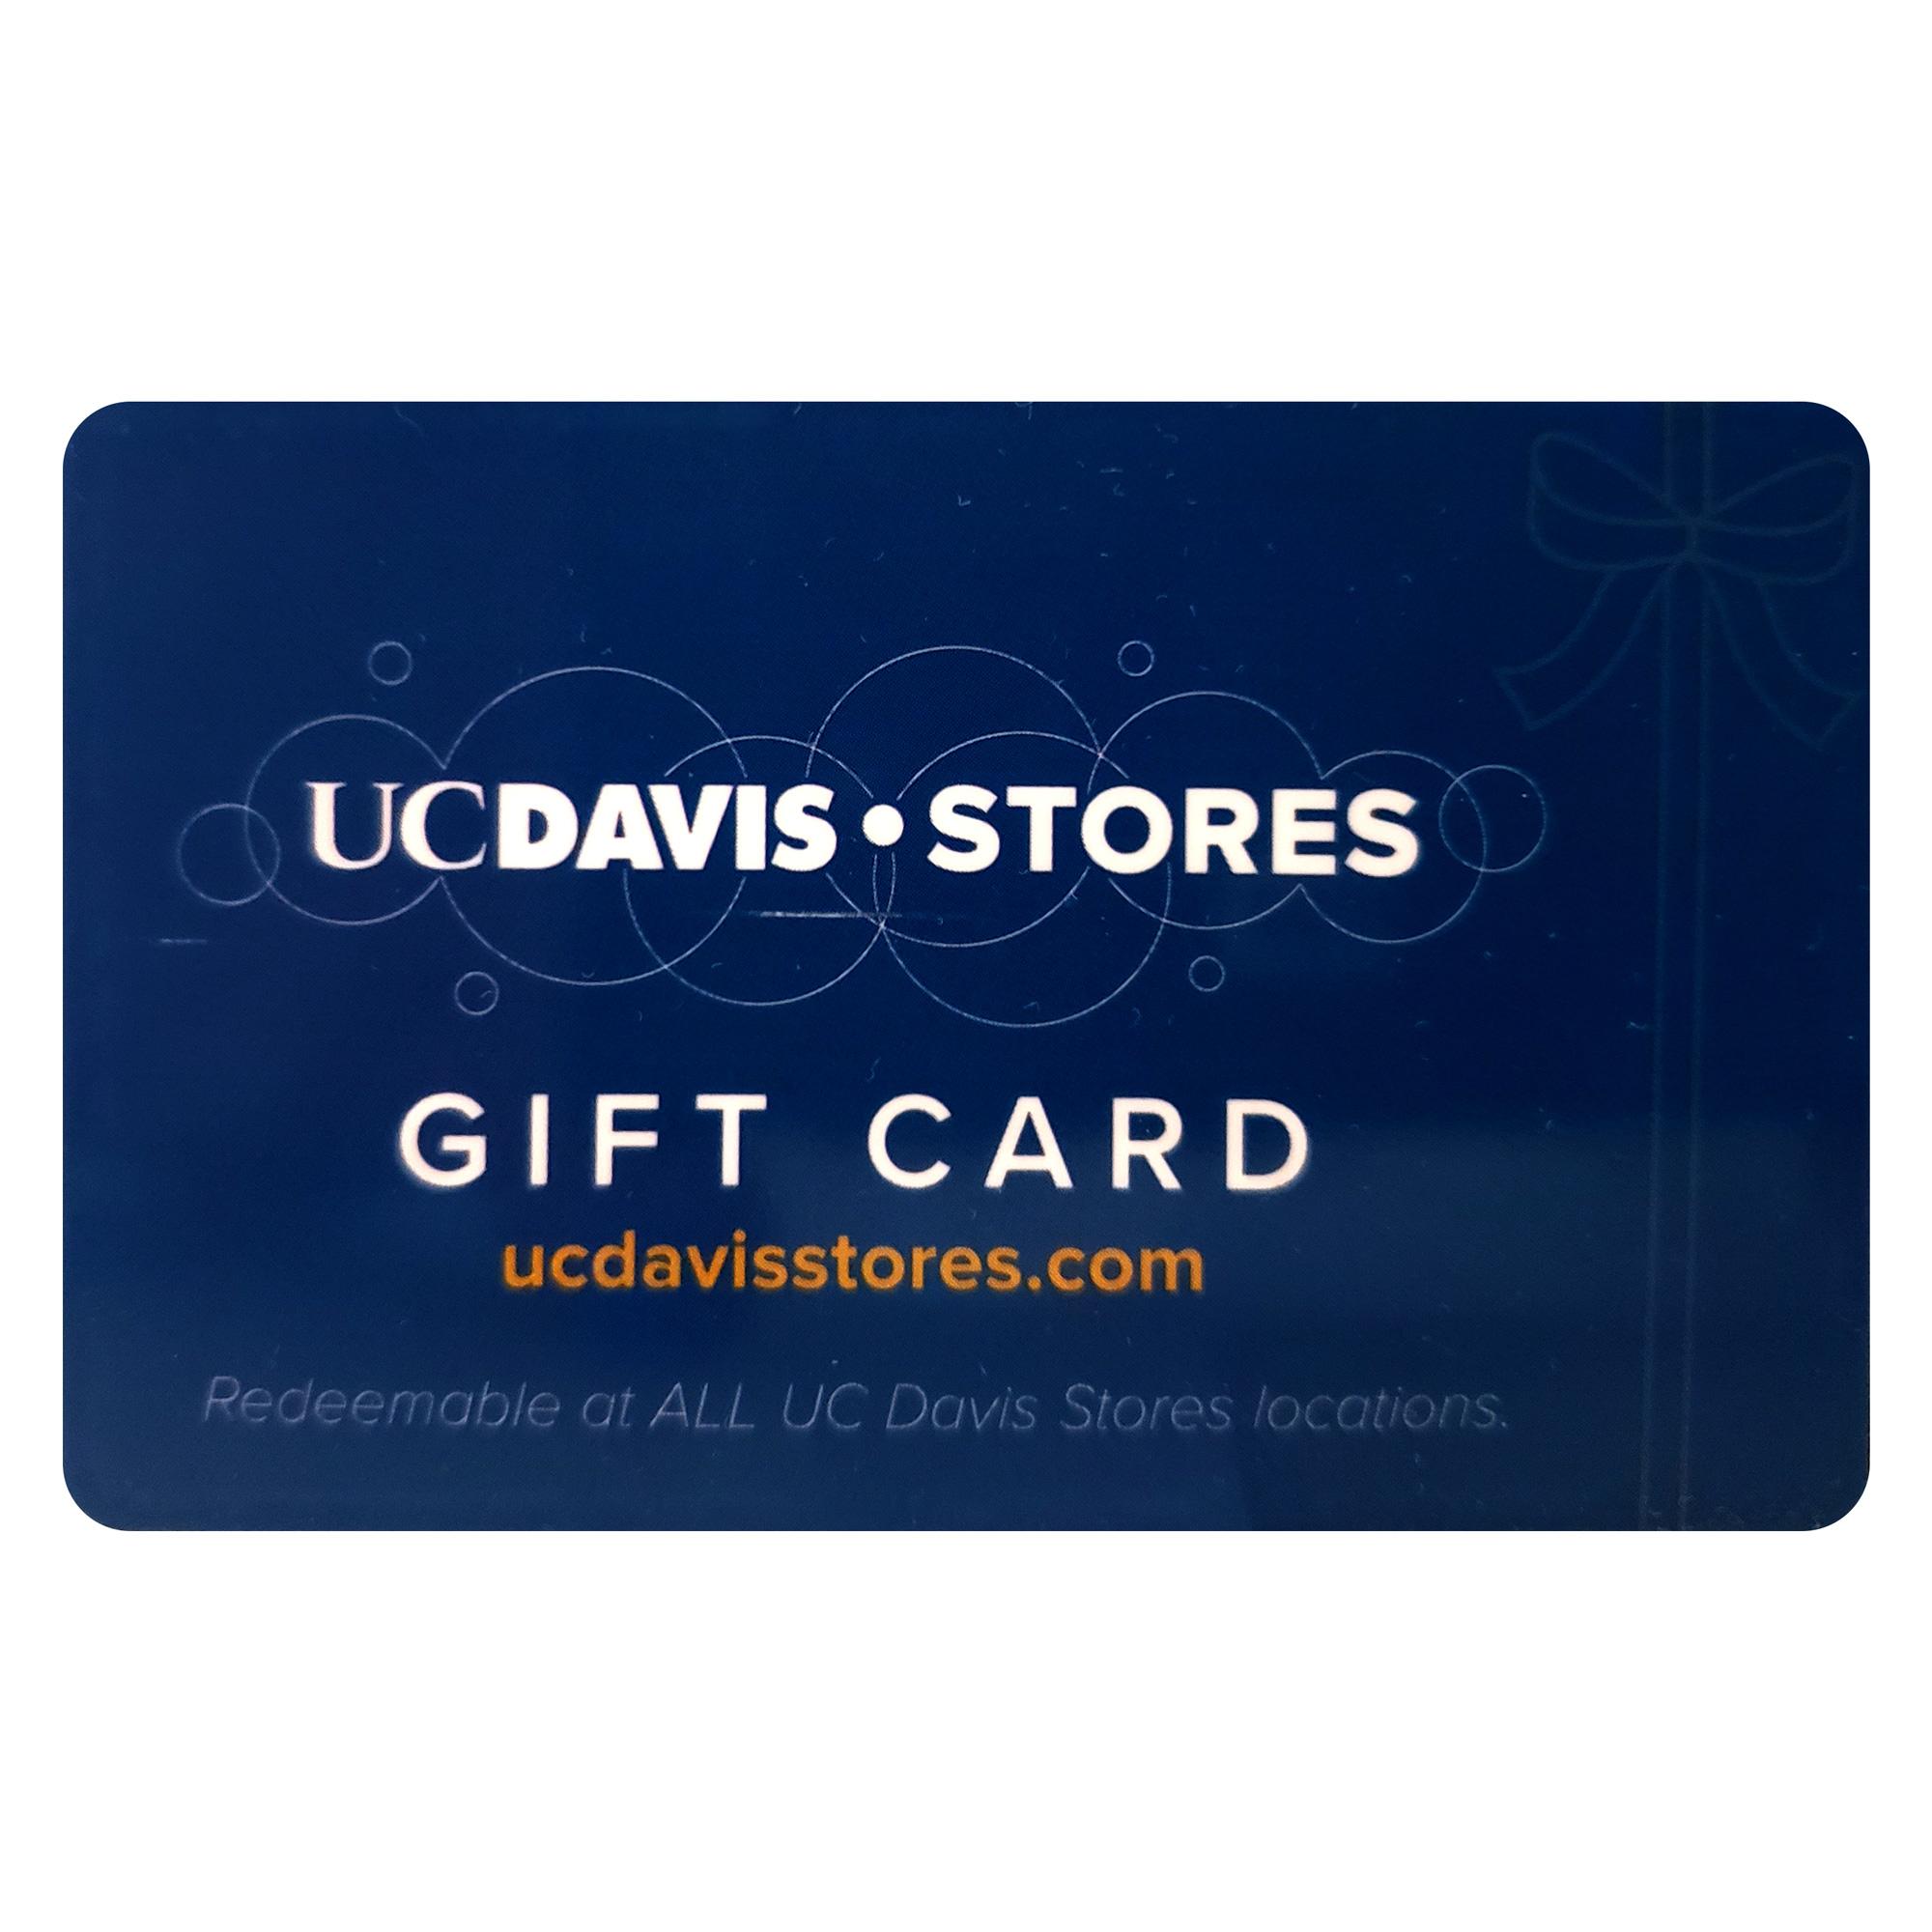 UC Davis Stores Gift Card